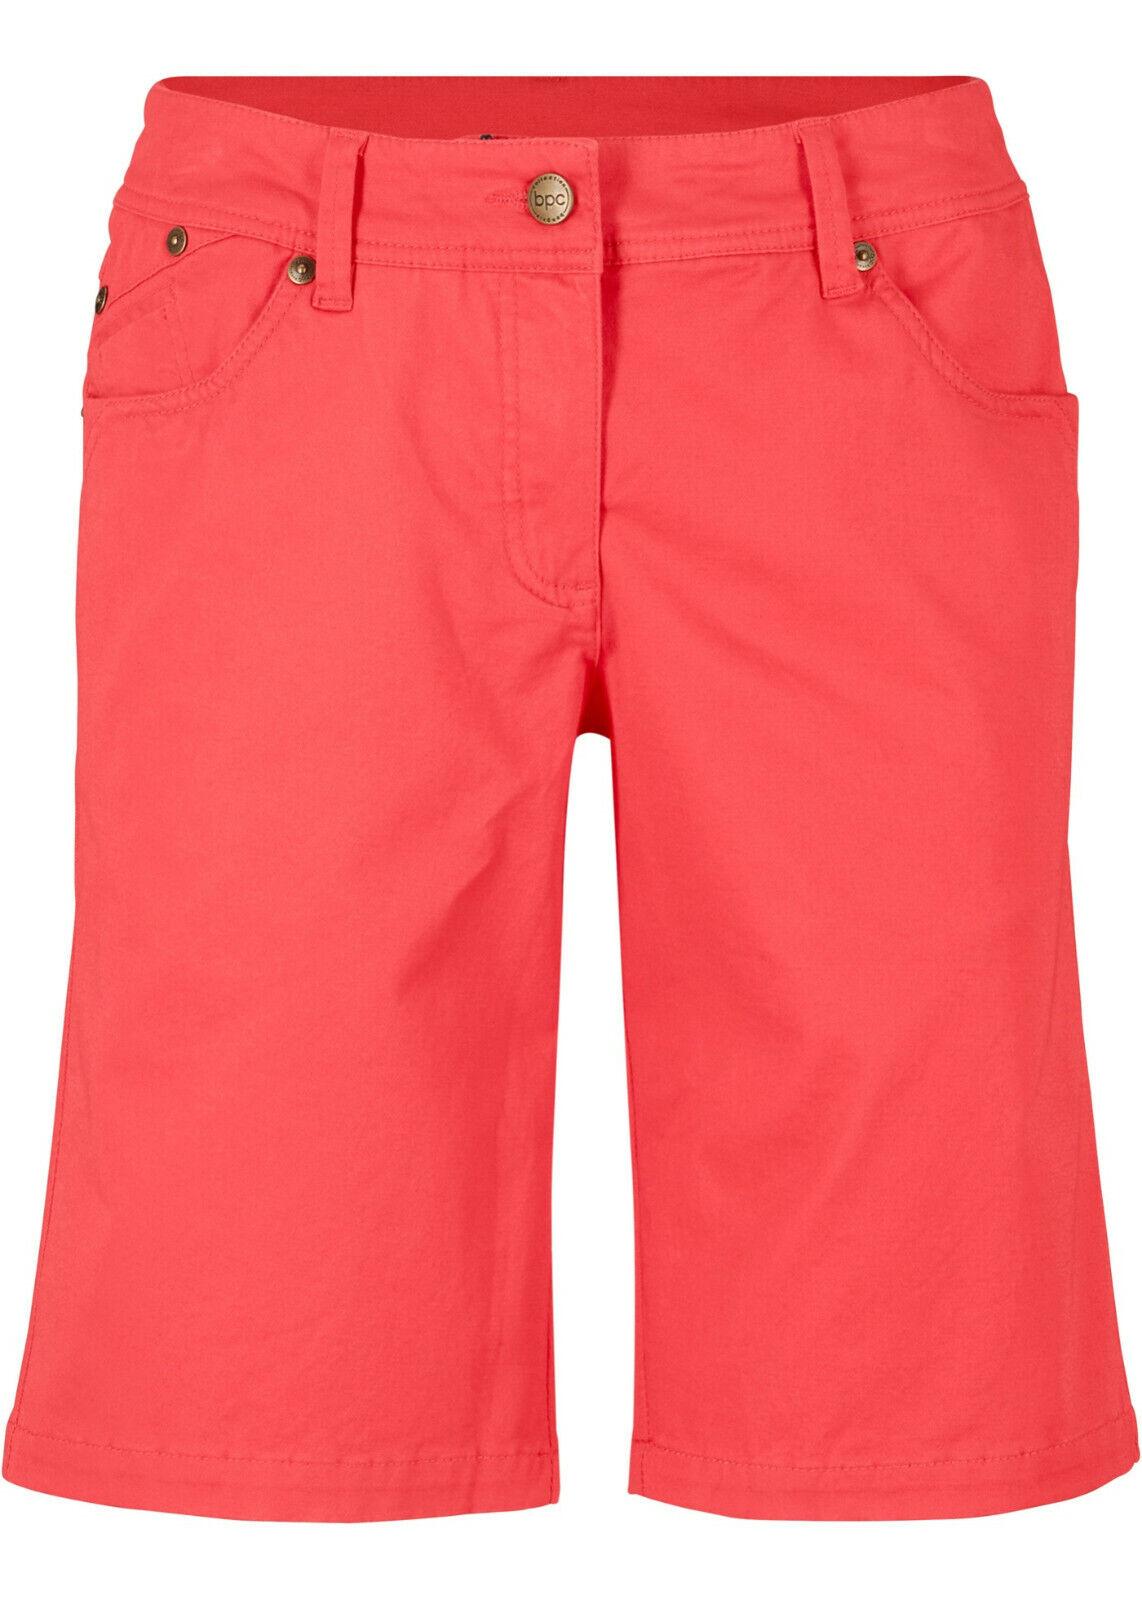 Schöne Bermuda im 5-Pocket-Stil Gr.50 rot